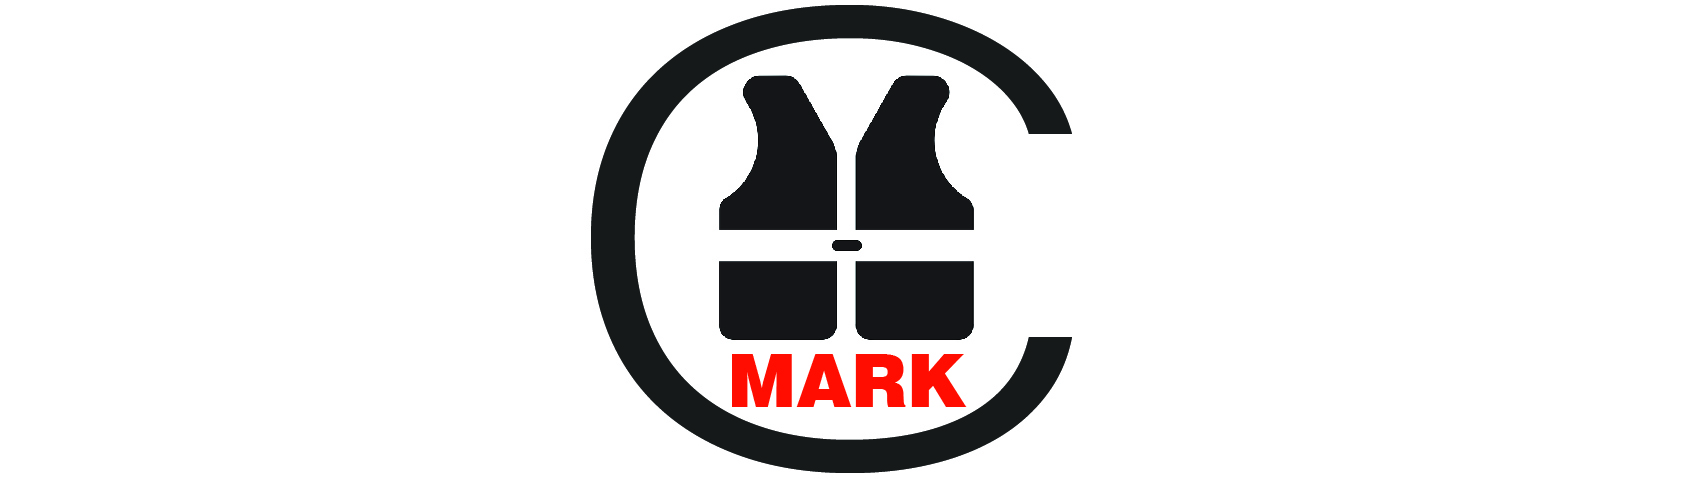 C-MARK